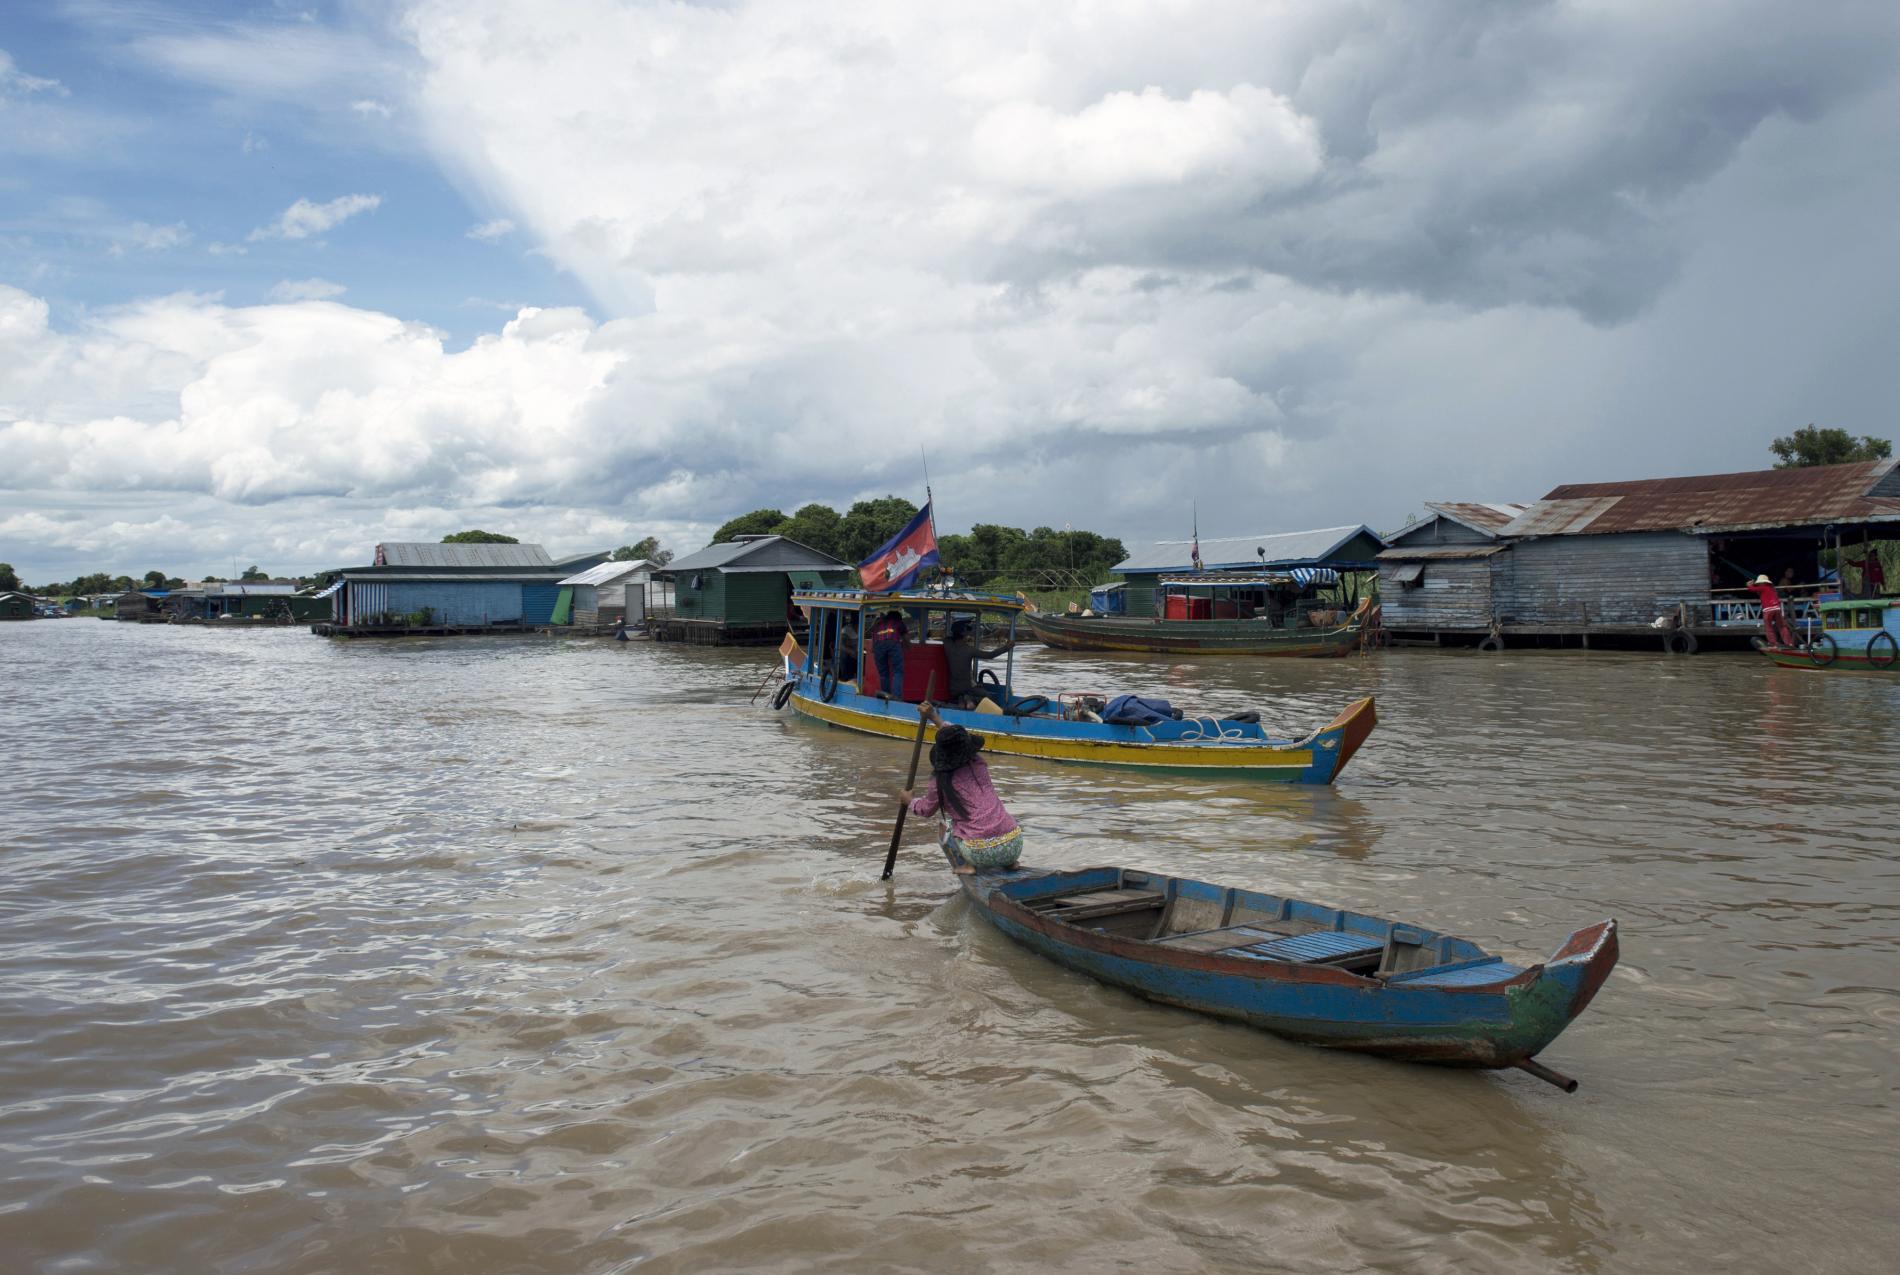 Voyage solidaire Vietnam-Cambodge : Vision du Monde - Photo 1